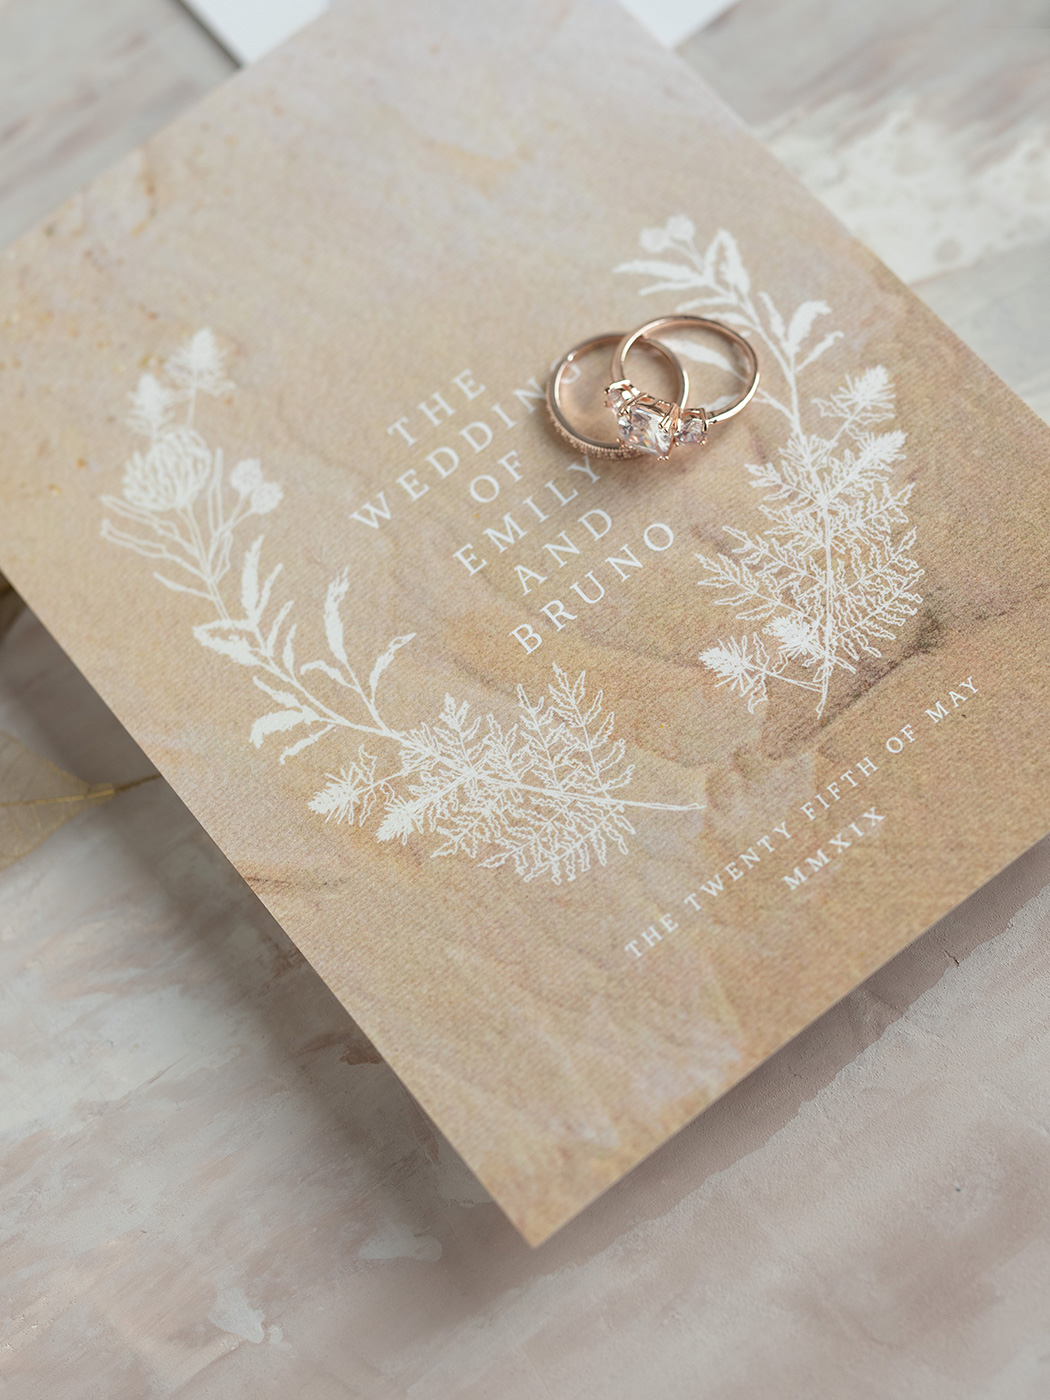 Wedding Stationery by Chrystalace | Rensche Mari